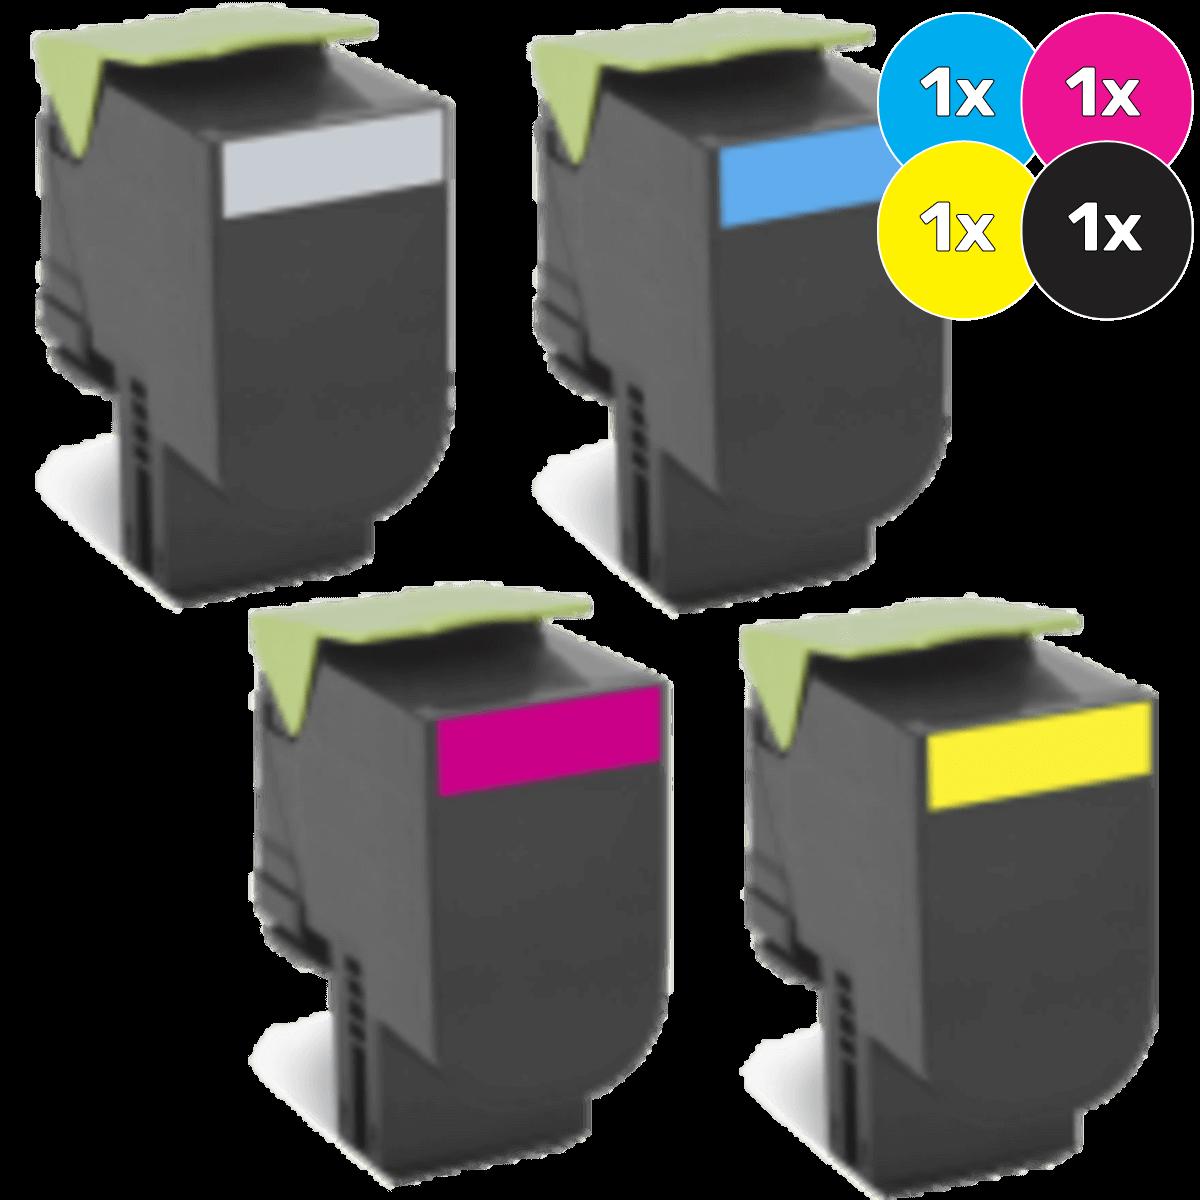 Lexmark Toner Cartridges Value Pack - Includes: [1 x Black, Cyan, Magenta, Yellow]